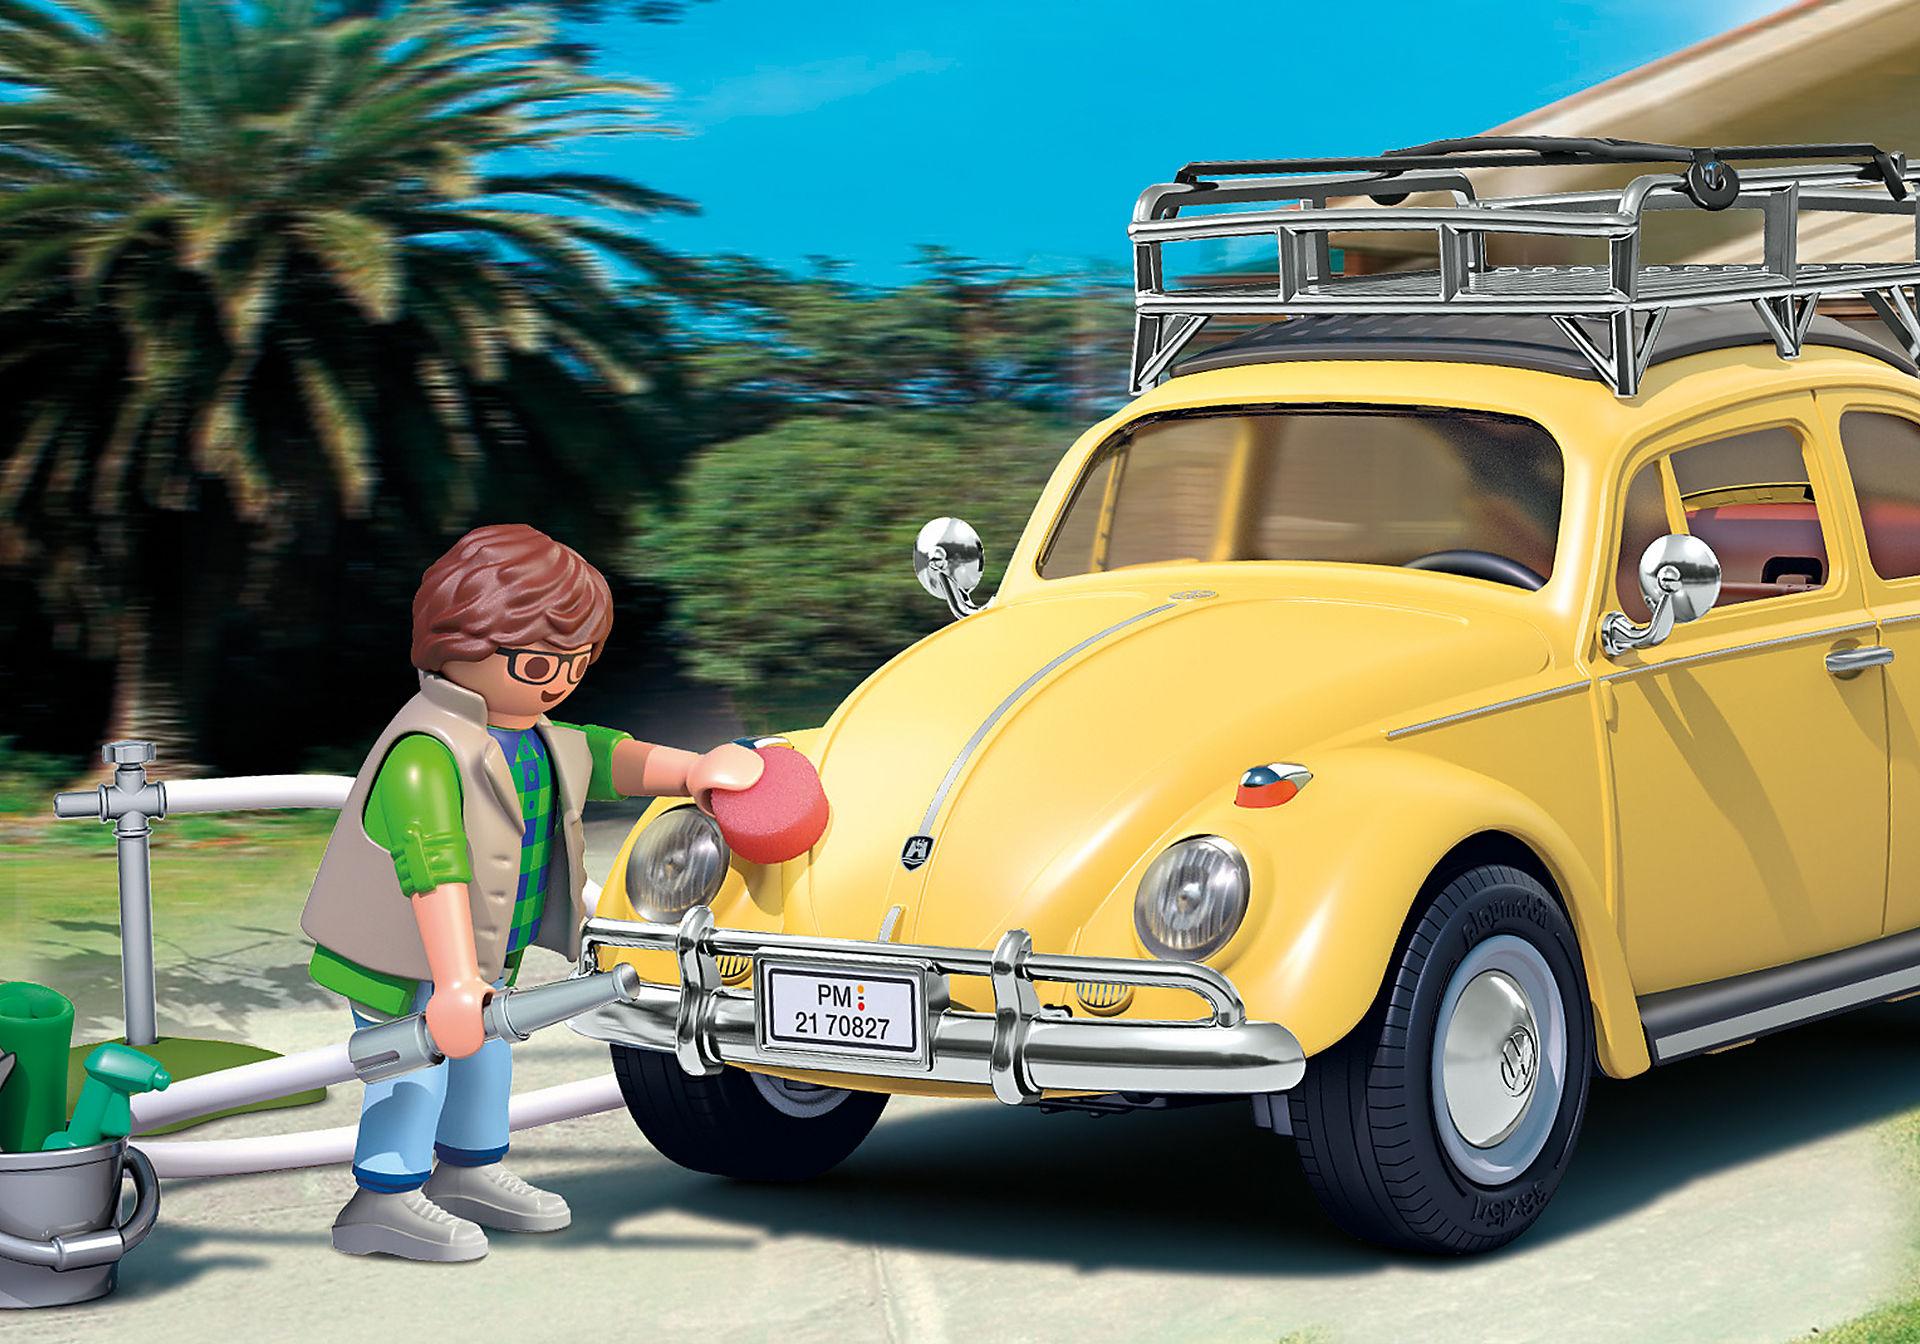 70827 Volkswagen Coccinelle - Edition spéciale zoom image7